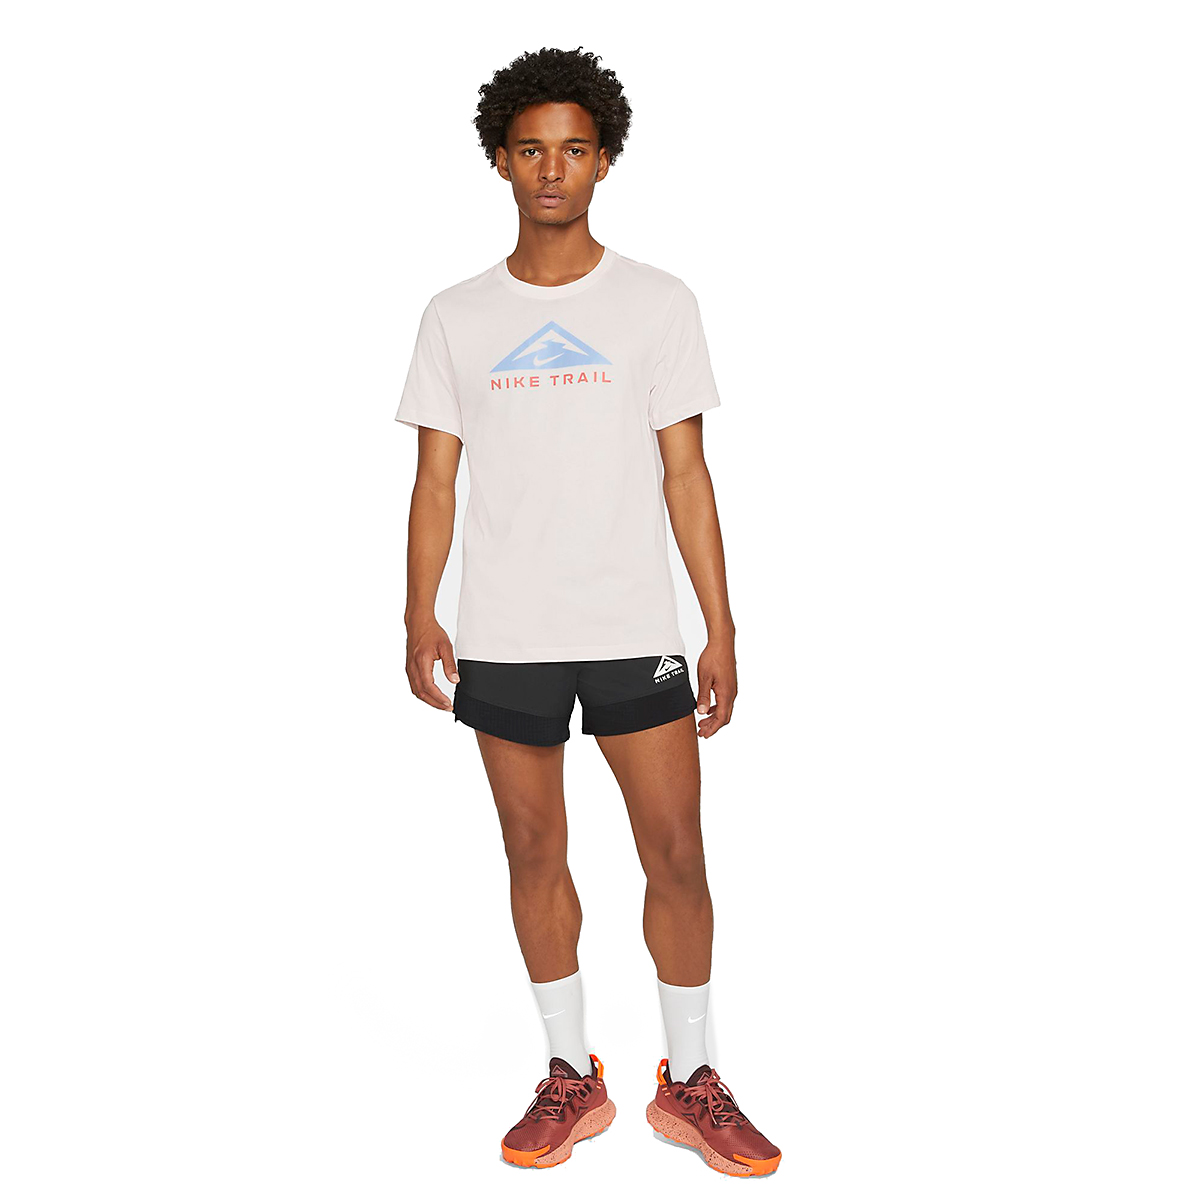 Men's Nike Dri-FIT Short Sleeve Trail Running T-Shirt - Color: Light Soft Pink - Size: XS, Light Soft Pink, large, image 4